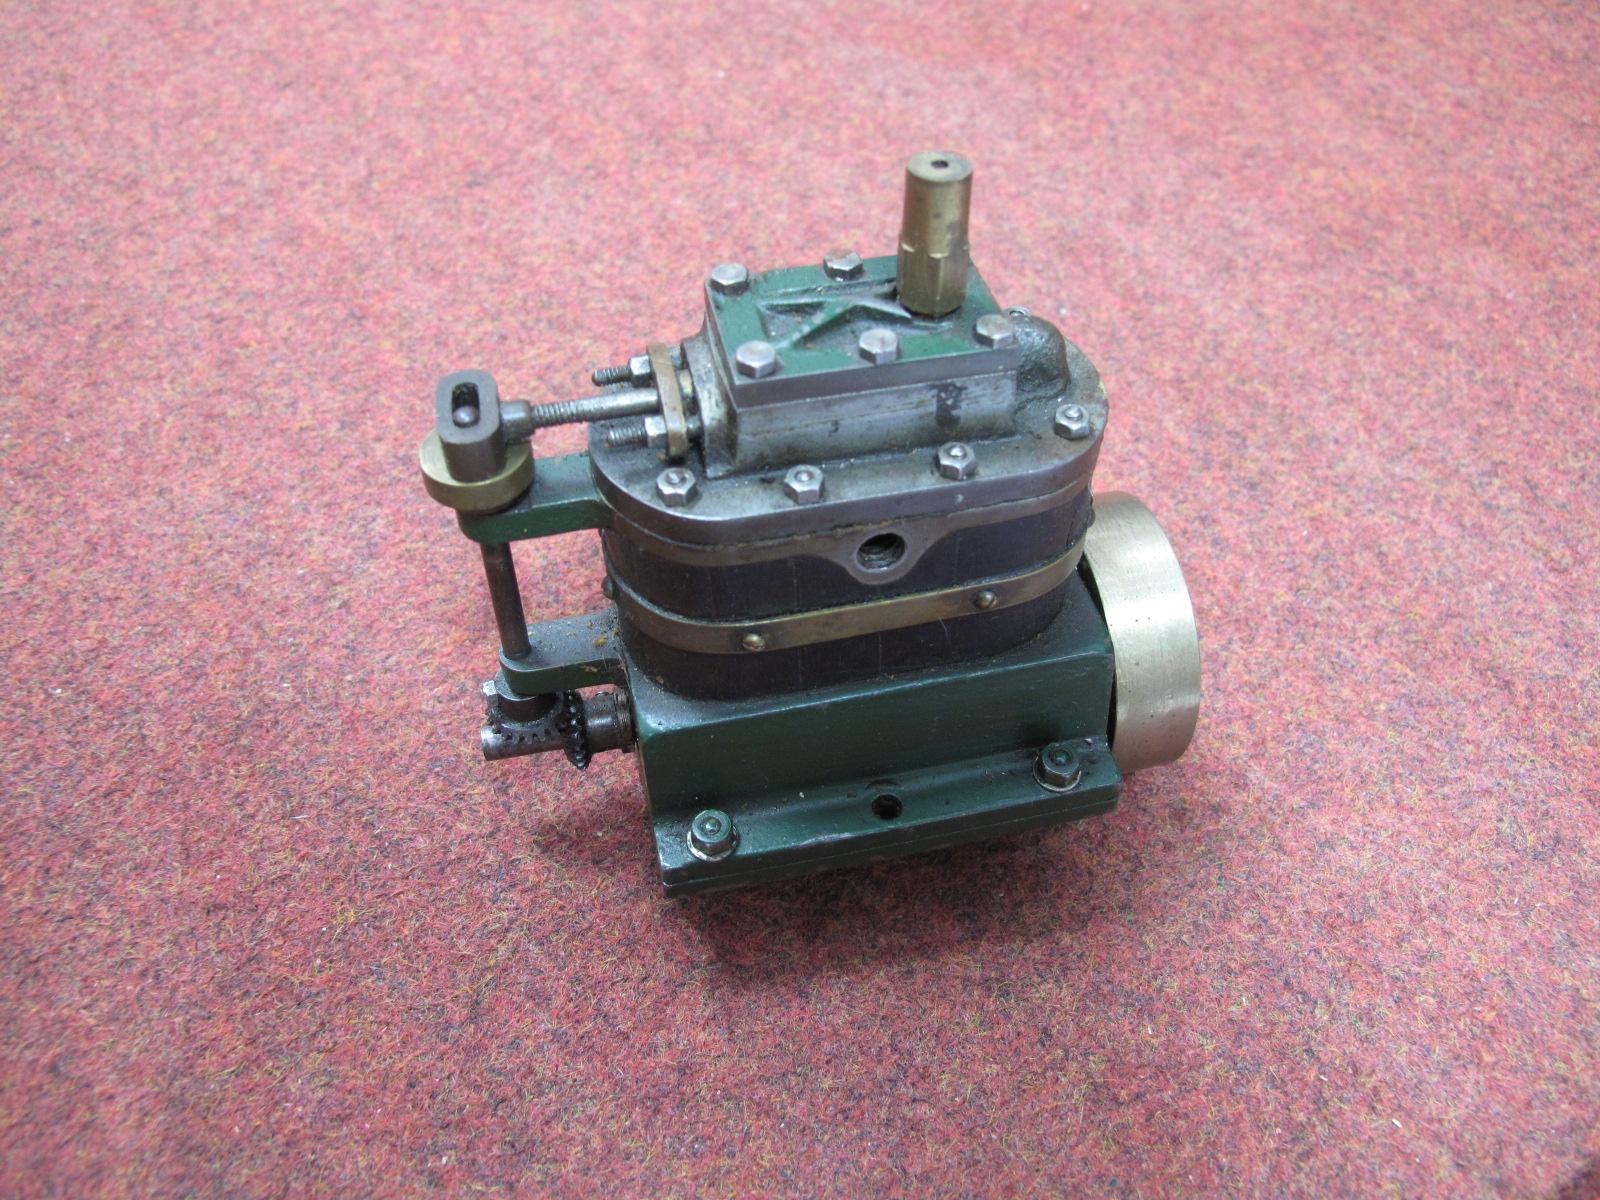 Lot 10 - A Stuart Live Steam Marine Engine, a boxed Stuart dynamo (unused) , a small engineered vertical twin